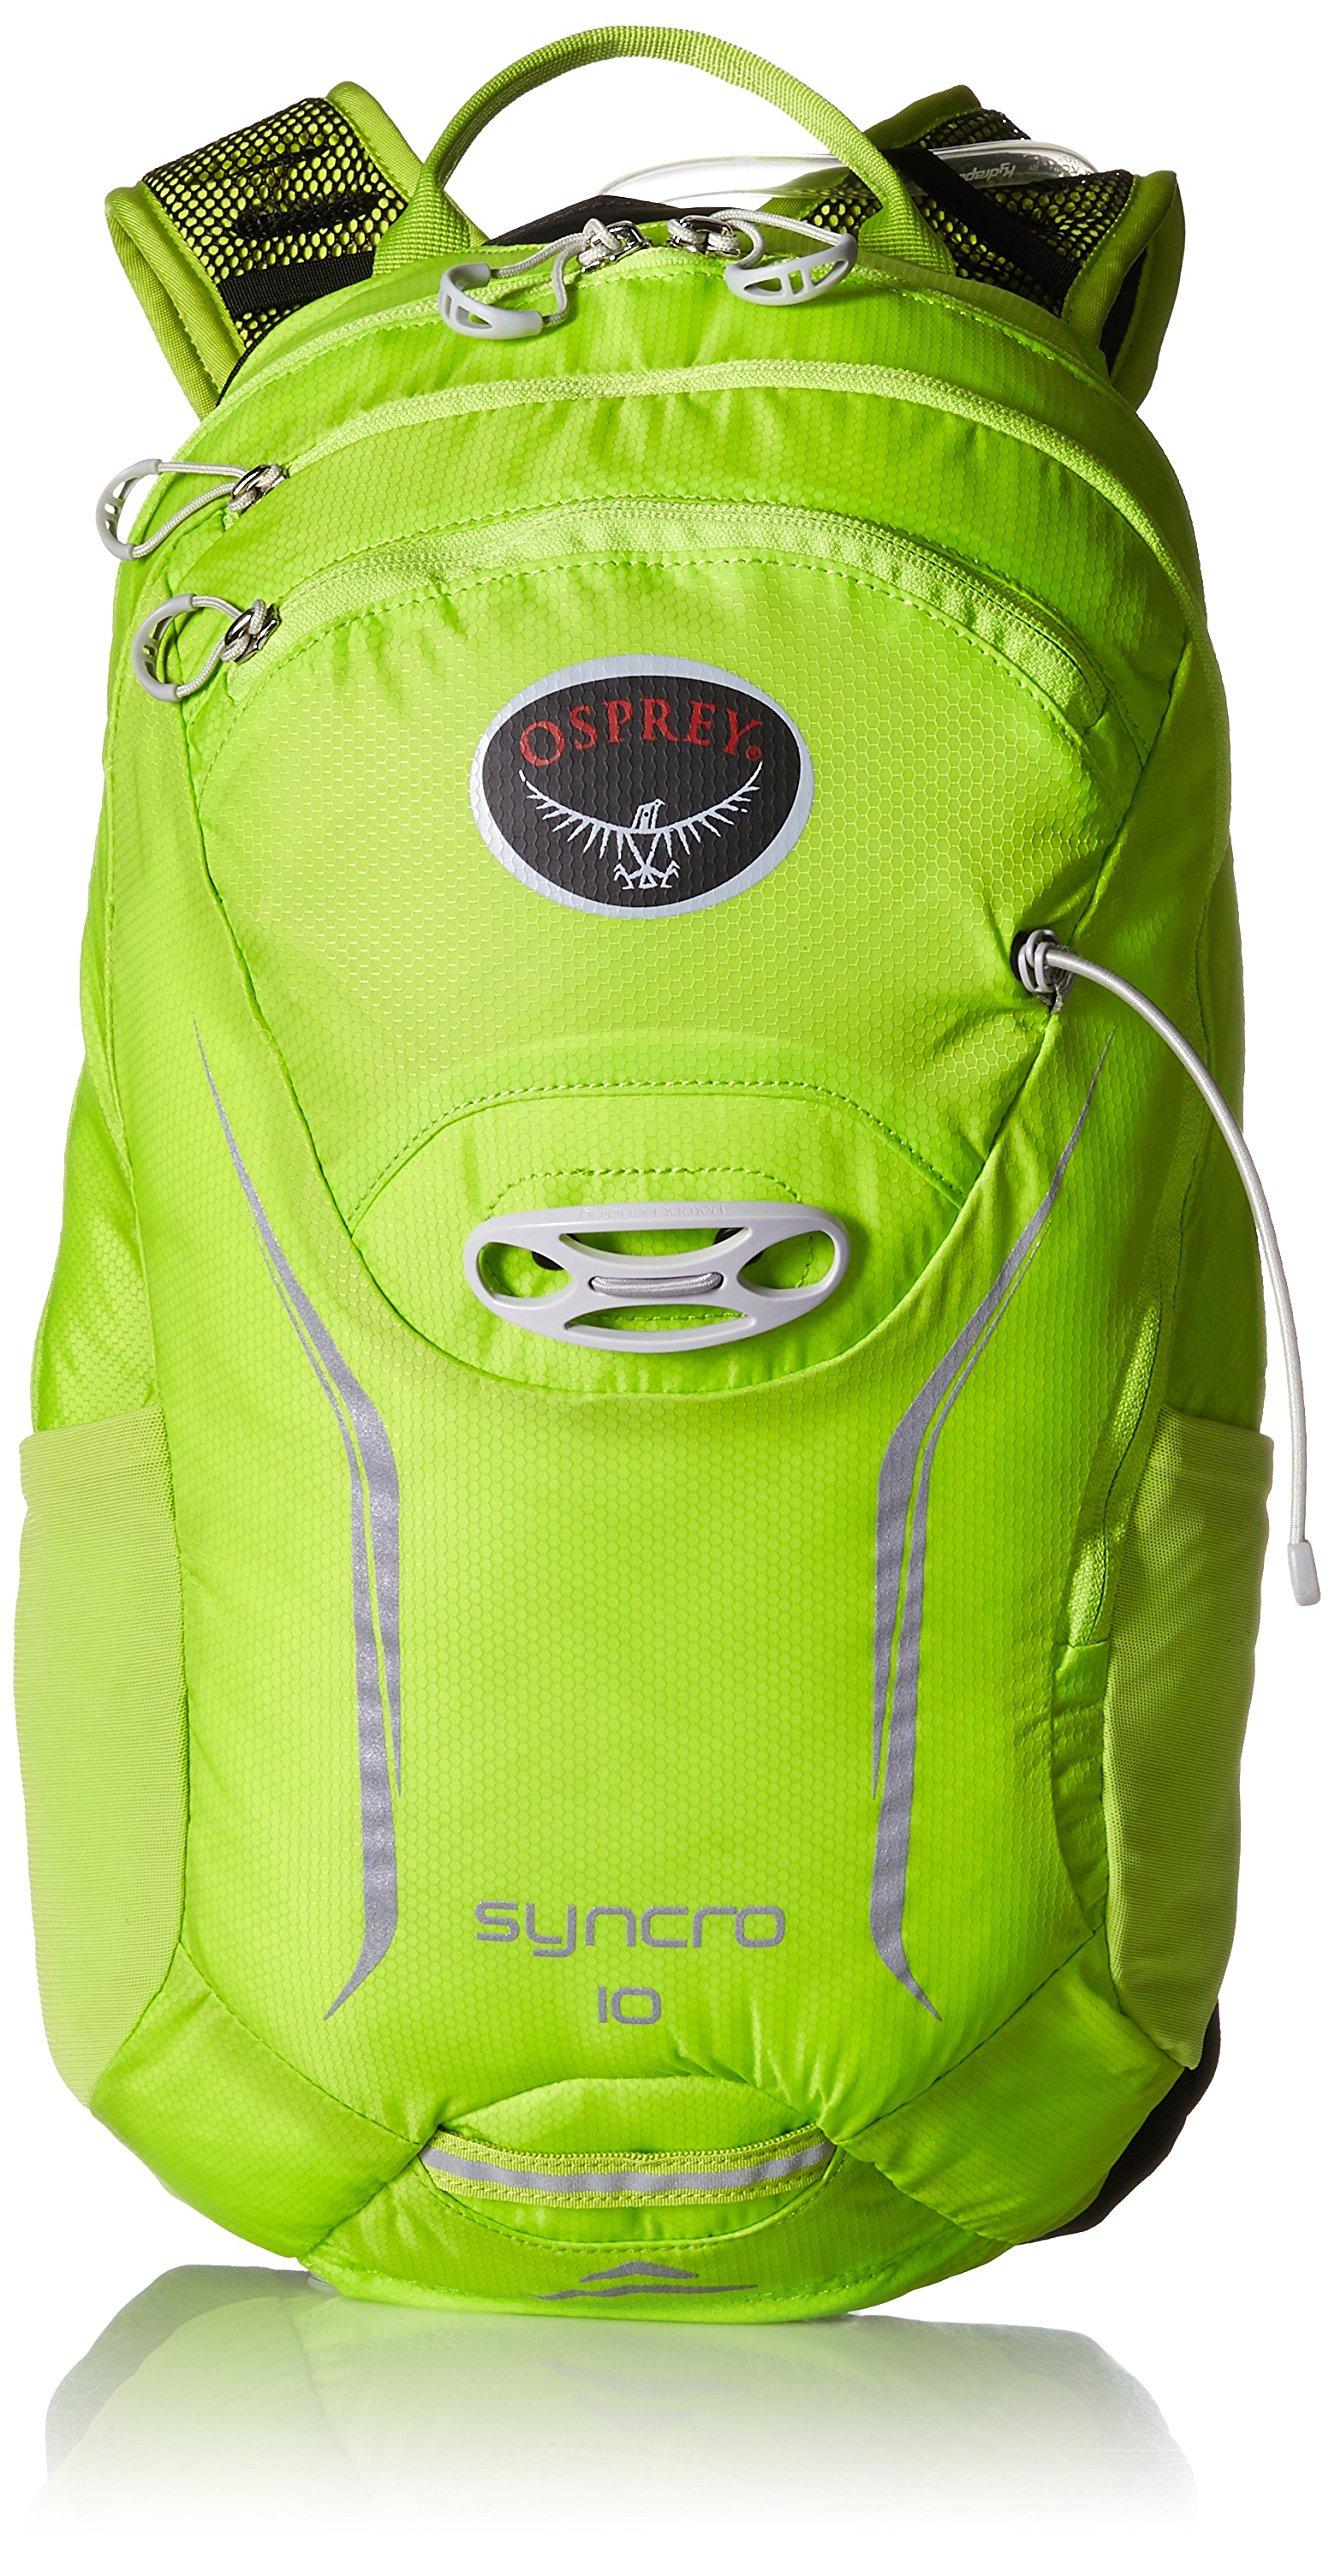 Osprey Packs Syncro 10 Hydration Pack, Velocity Green, Small/Medium